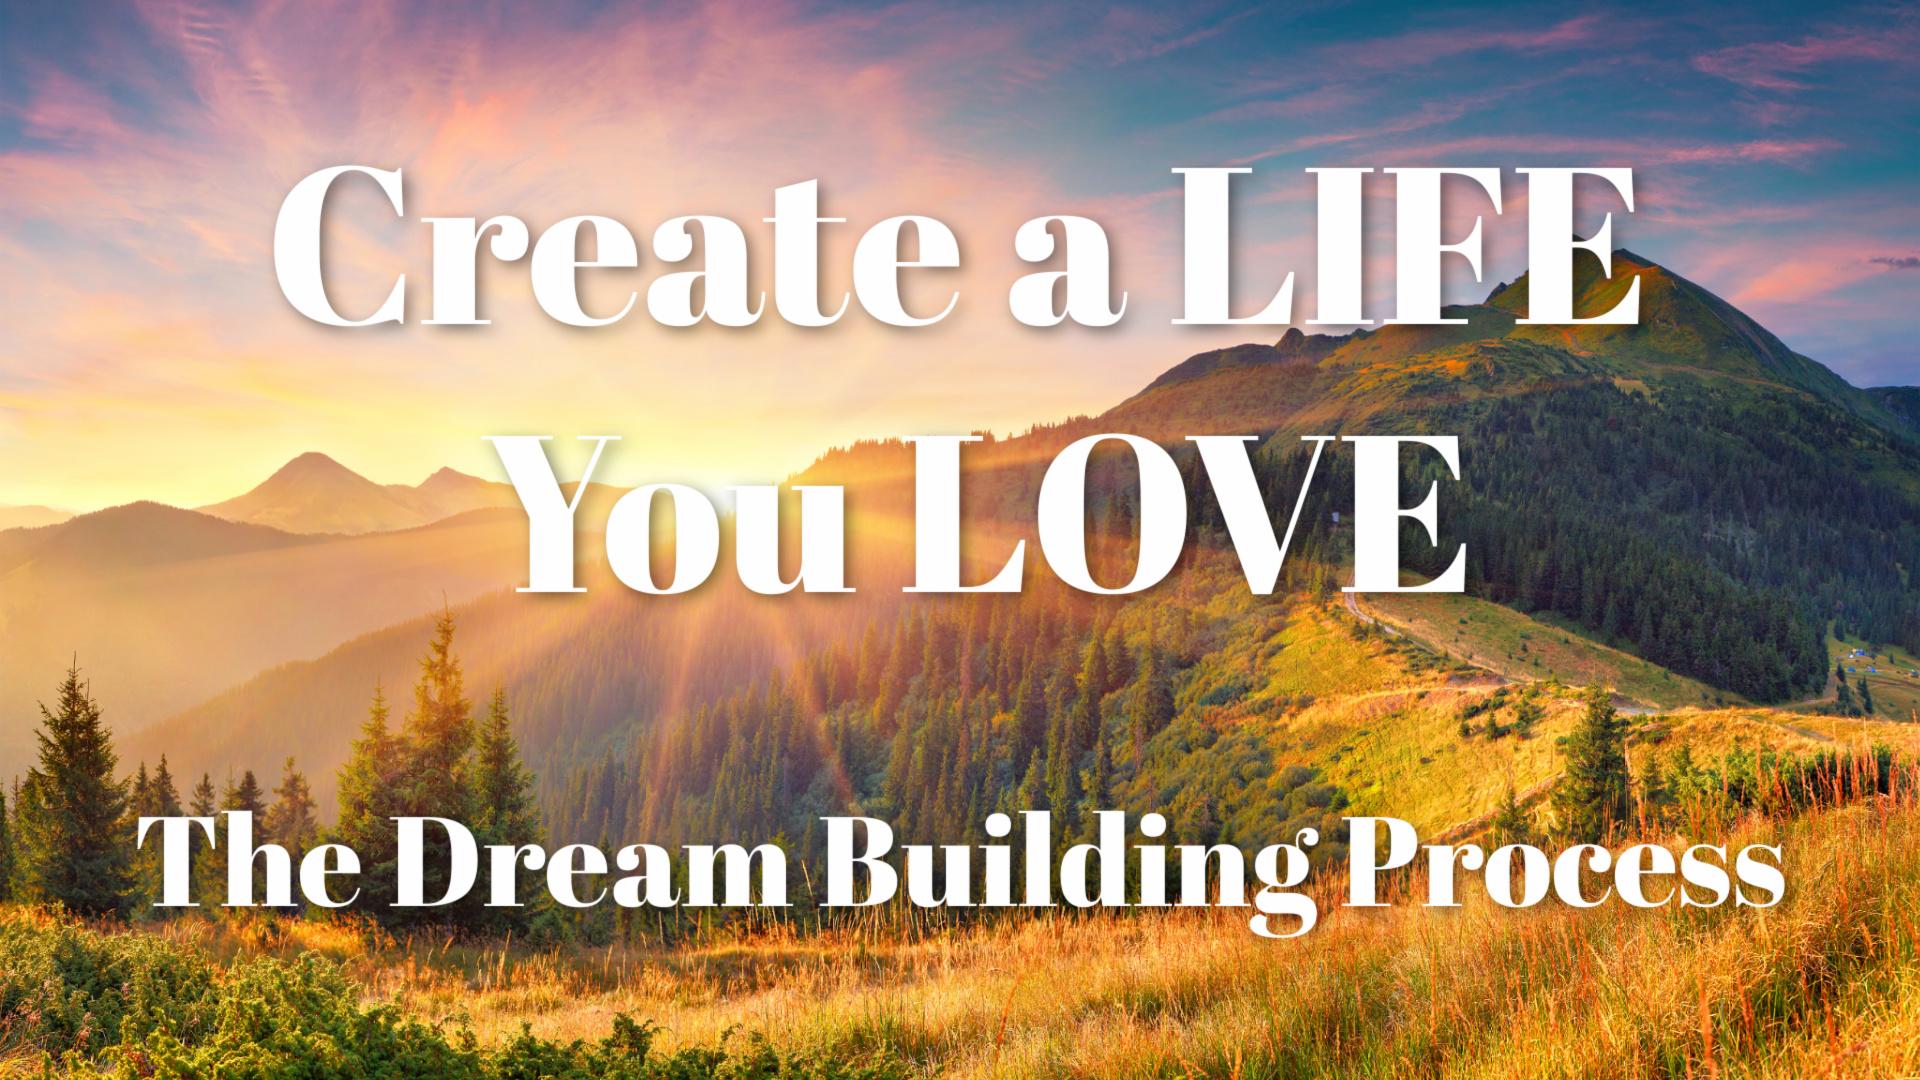 The Dream Building Process